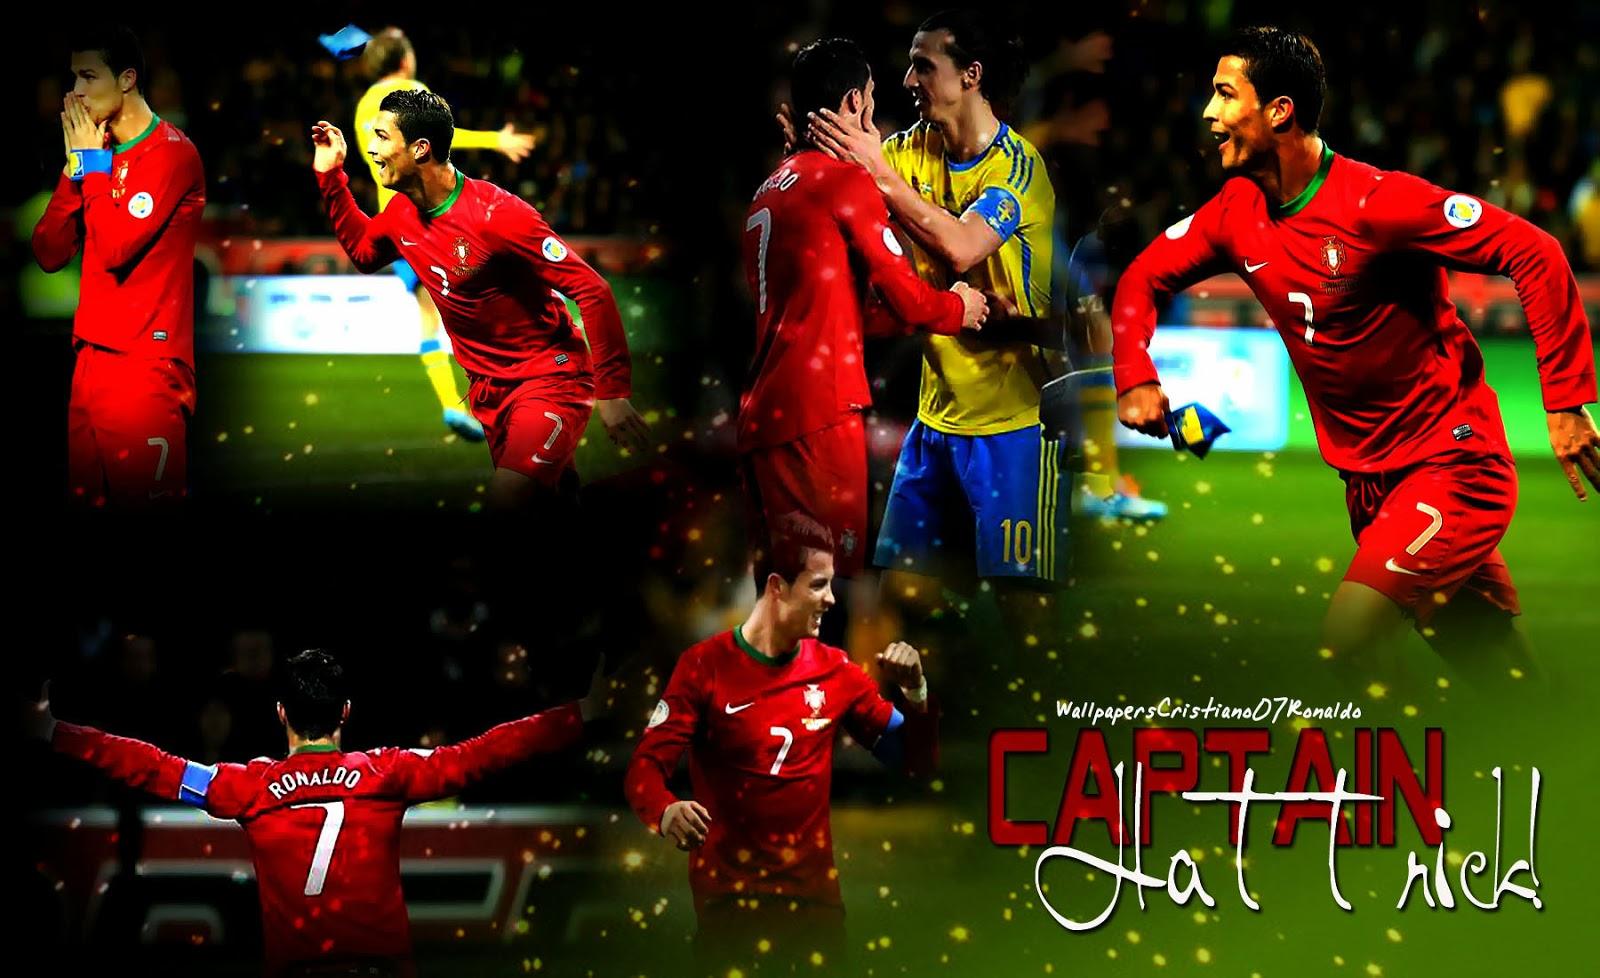 Cristiano Ronaldo Wallpapers: November 2013